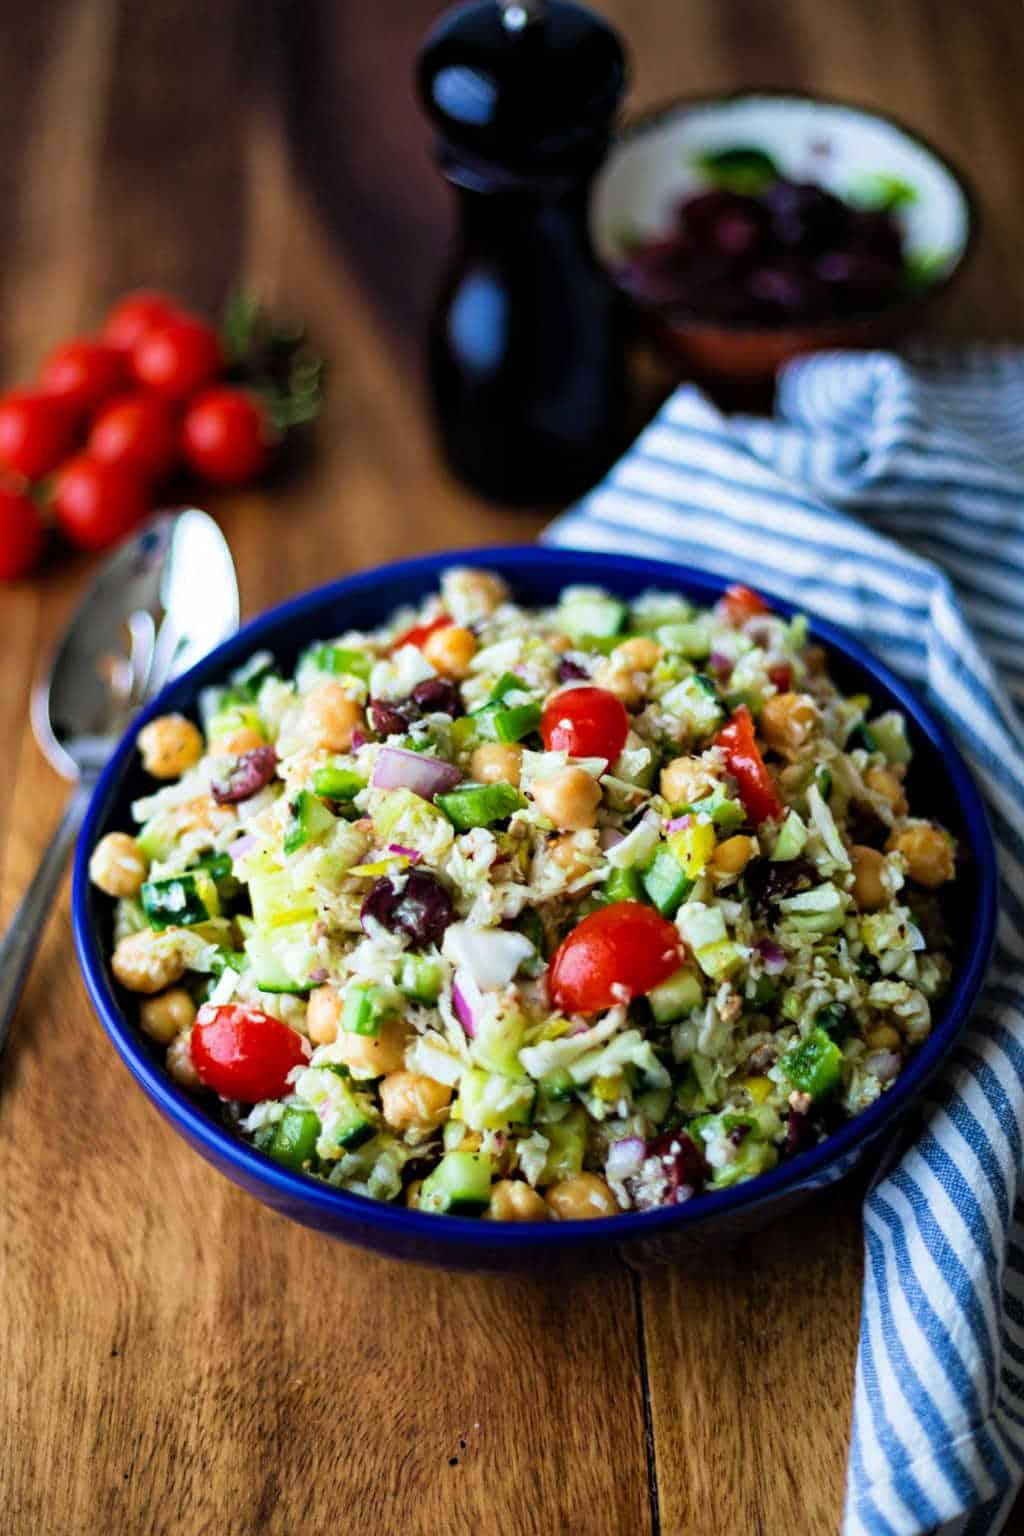 healthy greek coleslaw in a blue bowl